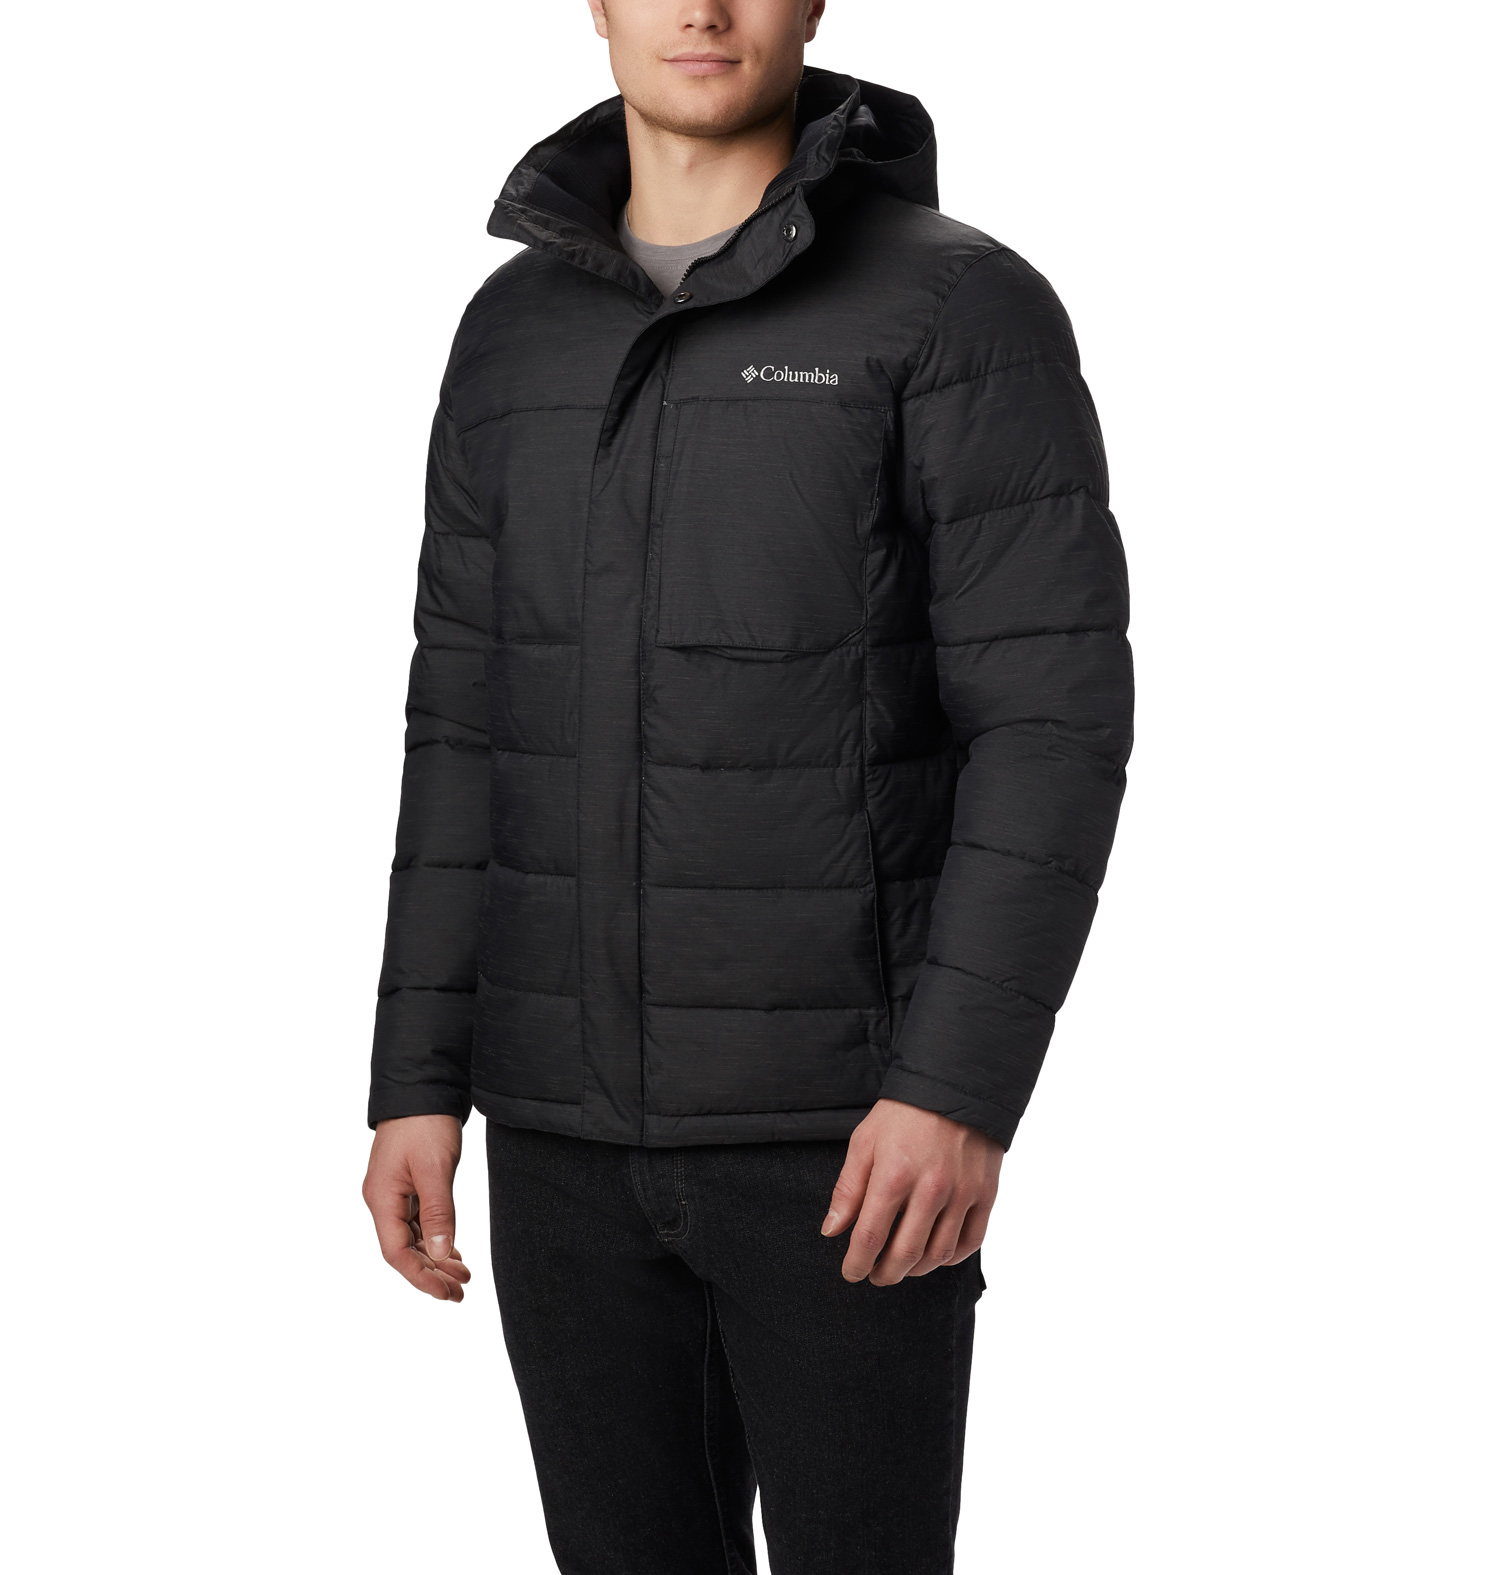 Columbia Ridgeview Peak Hooded Jacket Men's